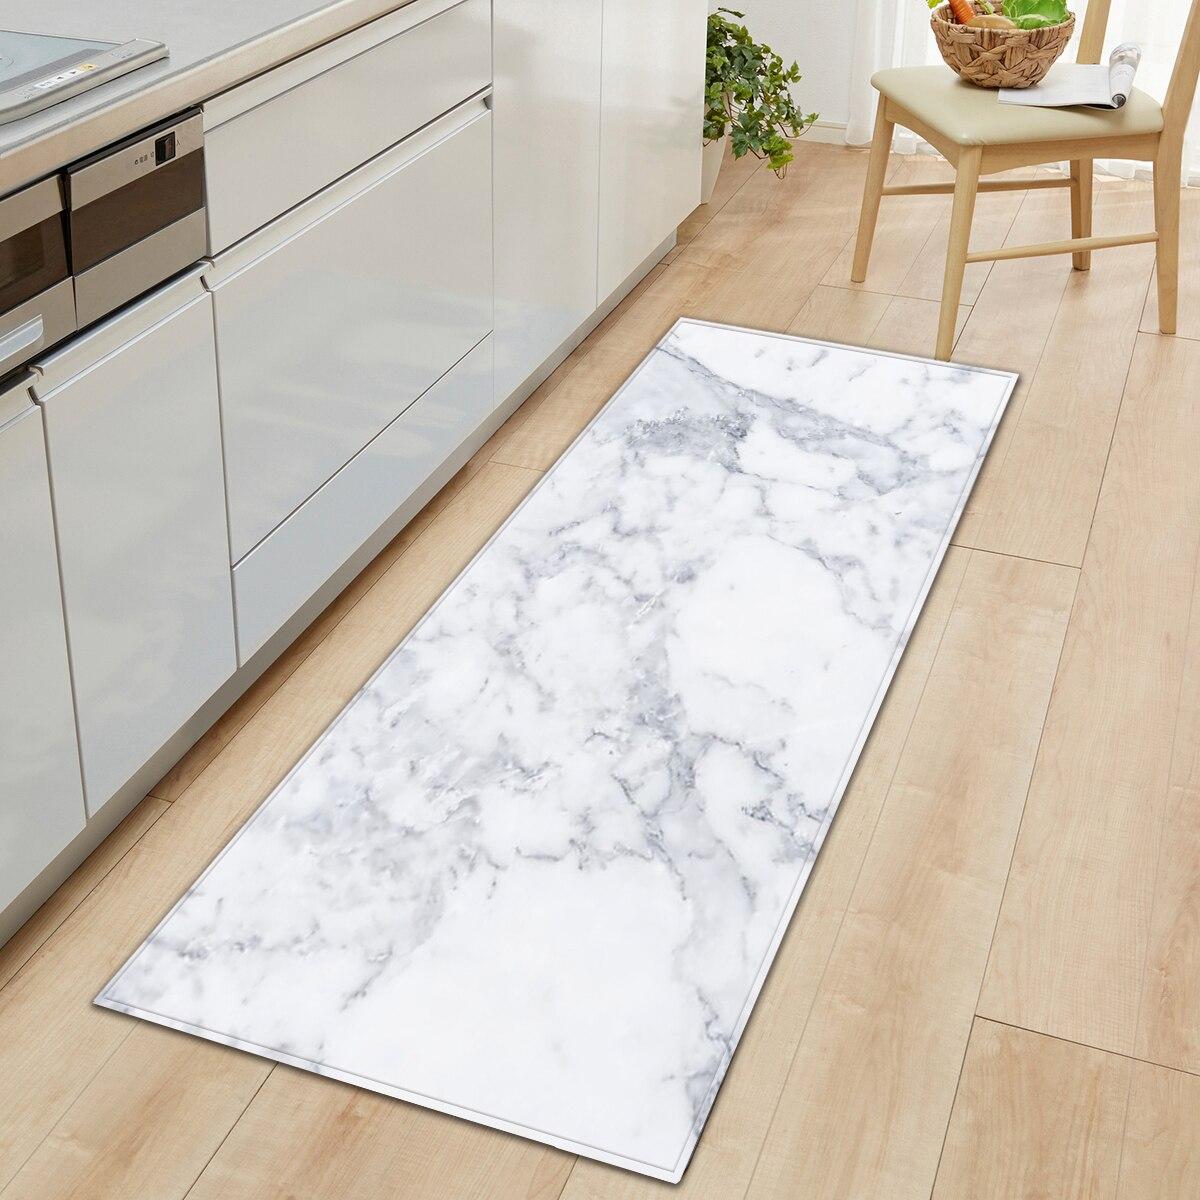 Marble Pattern Printed Floor Mat Kitchen Non Slip Floor Mats For Living Rooms Door Mats Entrance Decor Floor Rug Carpet